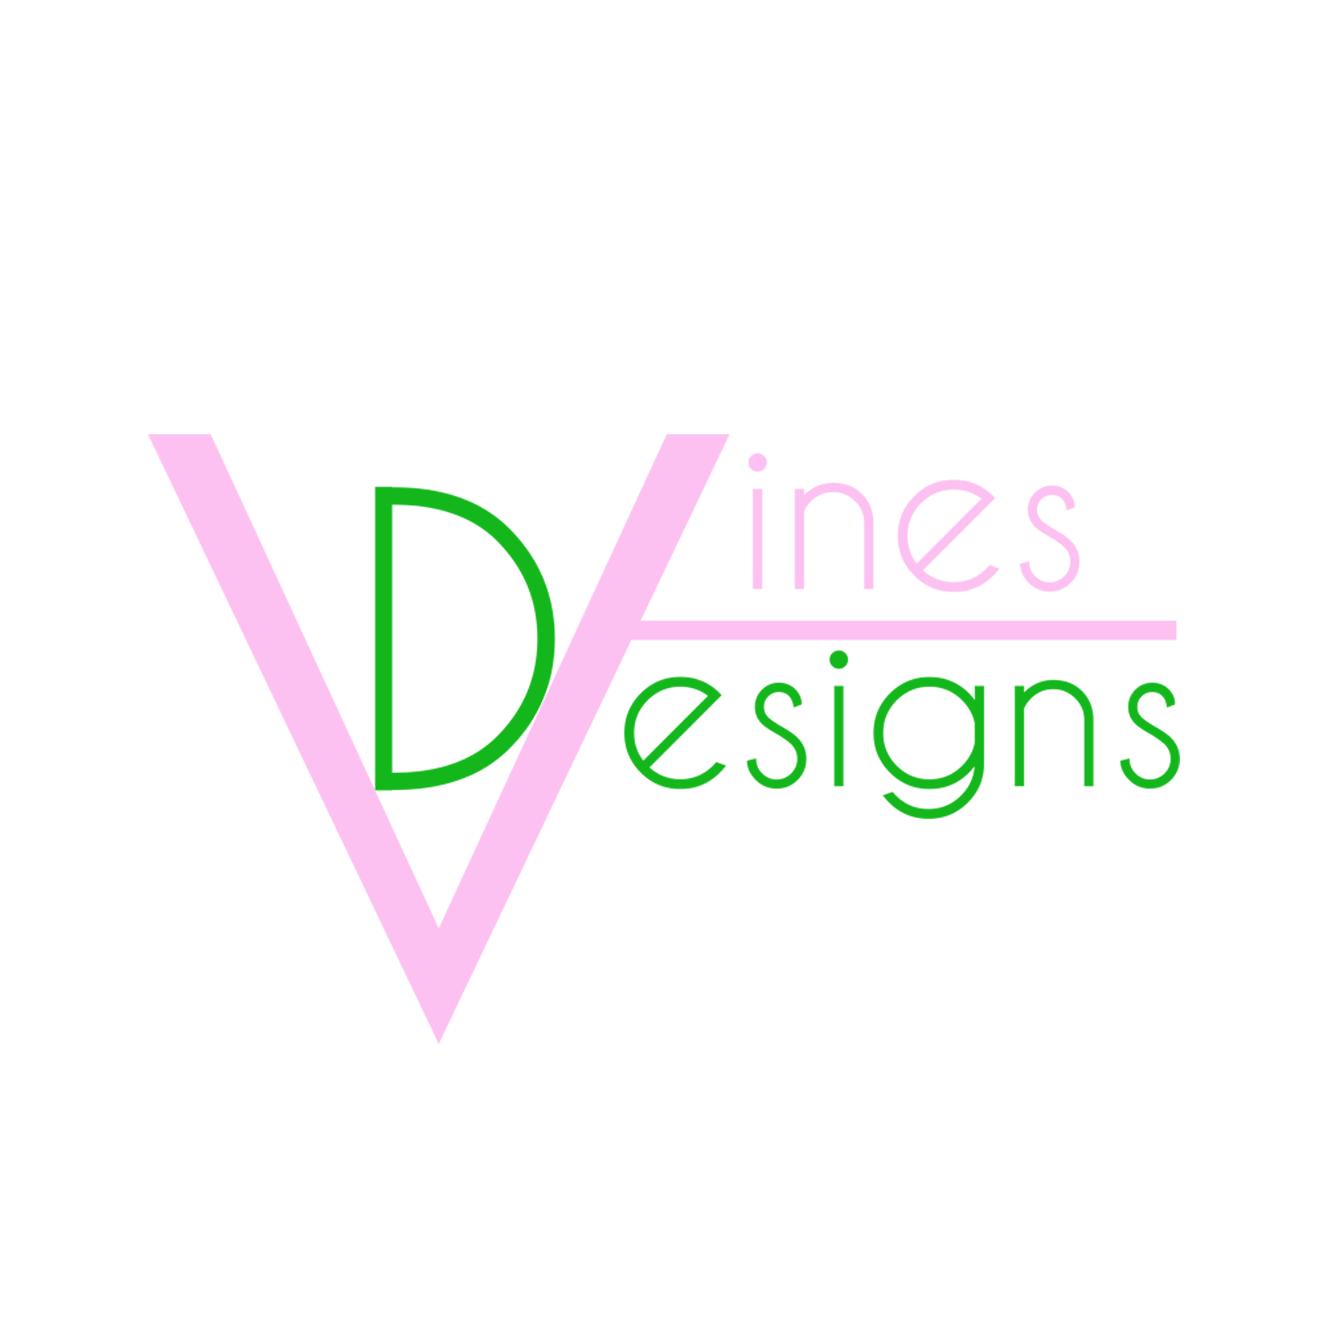 Vines Designs Service Request